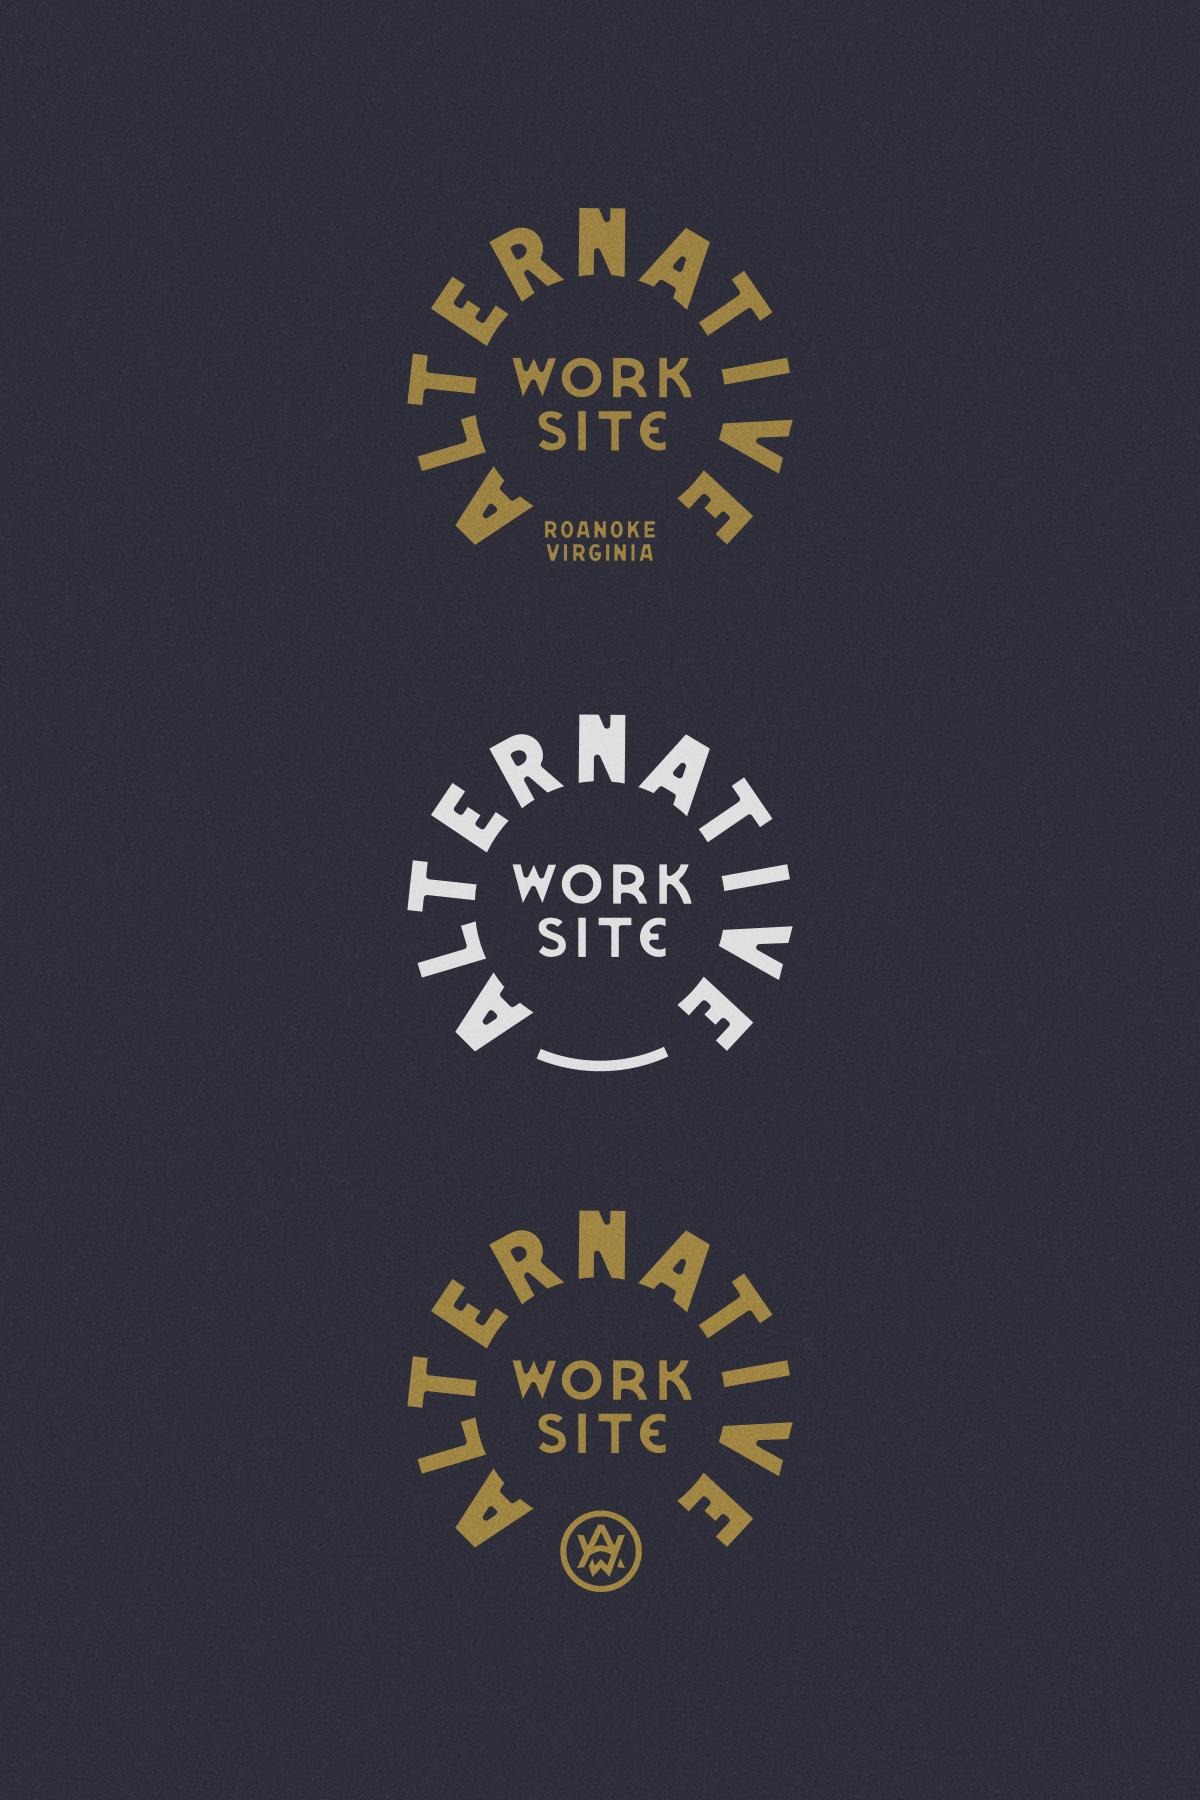 TBS_AlternativeWorksite_Variations_1